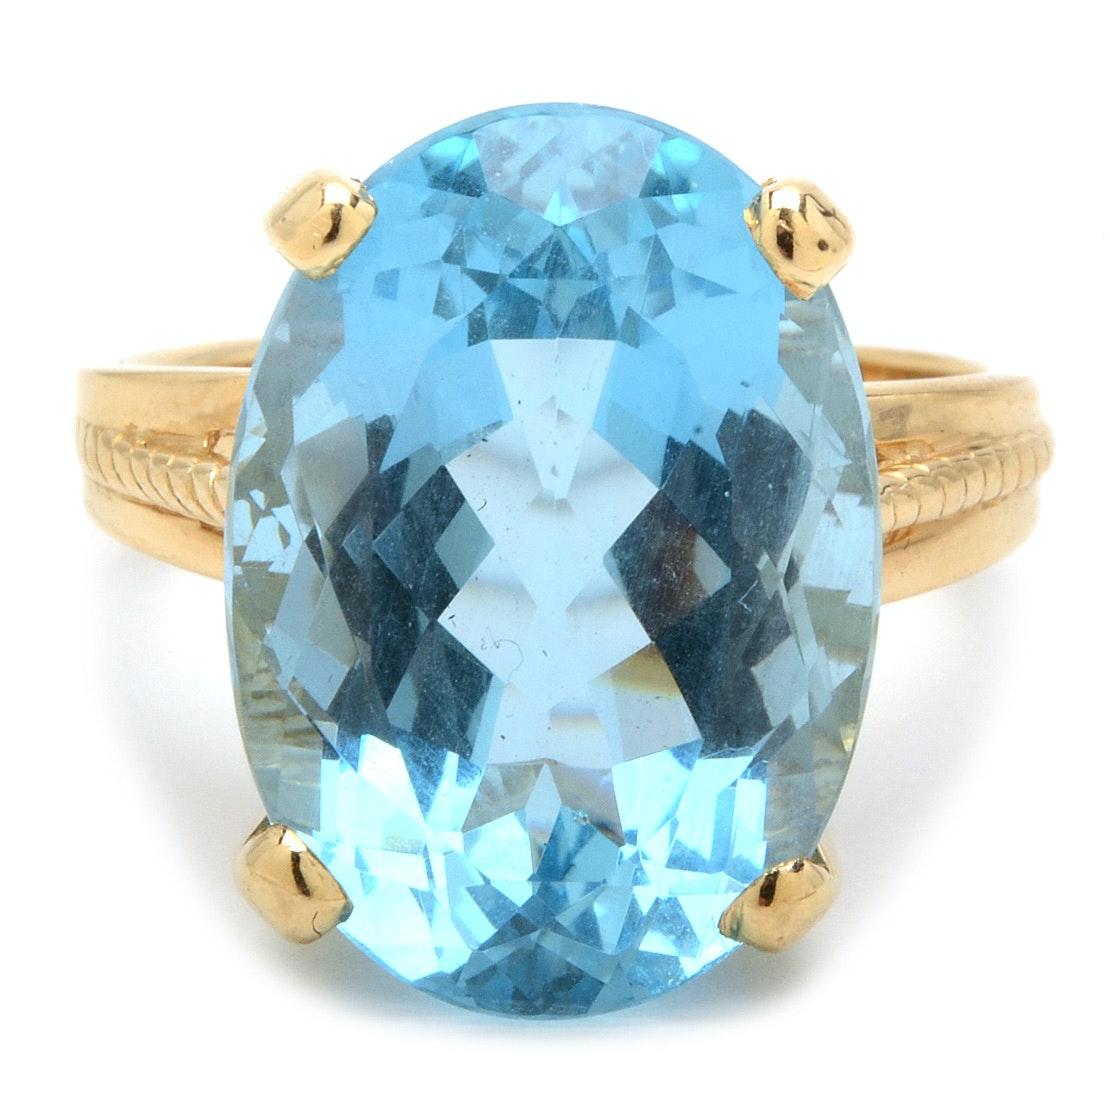 14K Yellow Gold 10.80 Carat Aquamarine Statement Ring